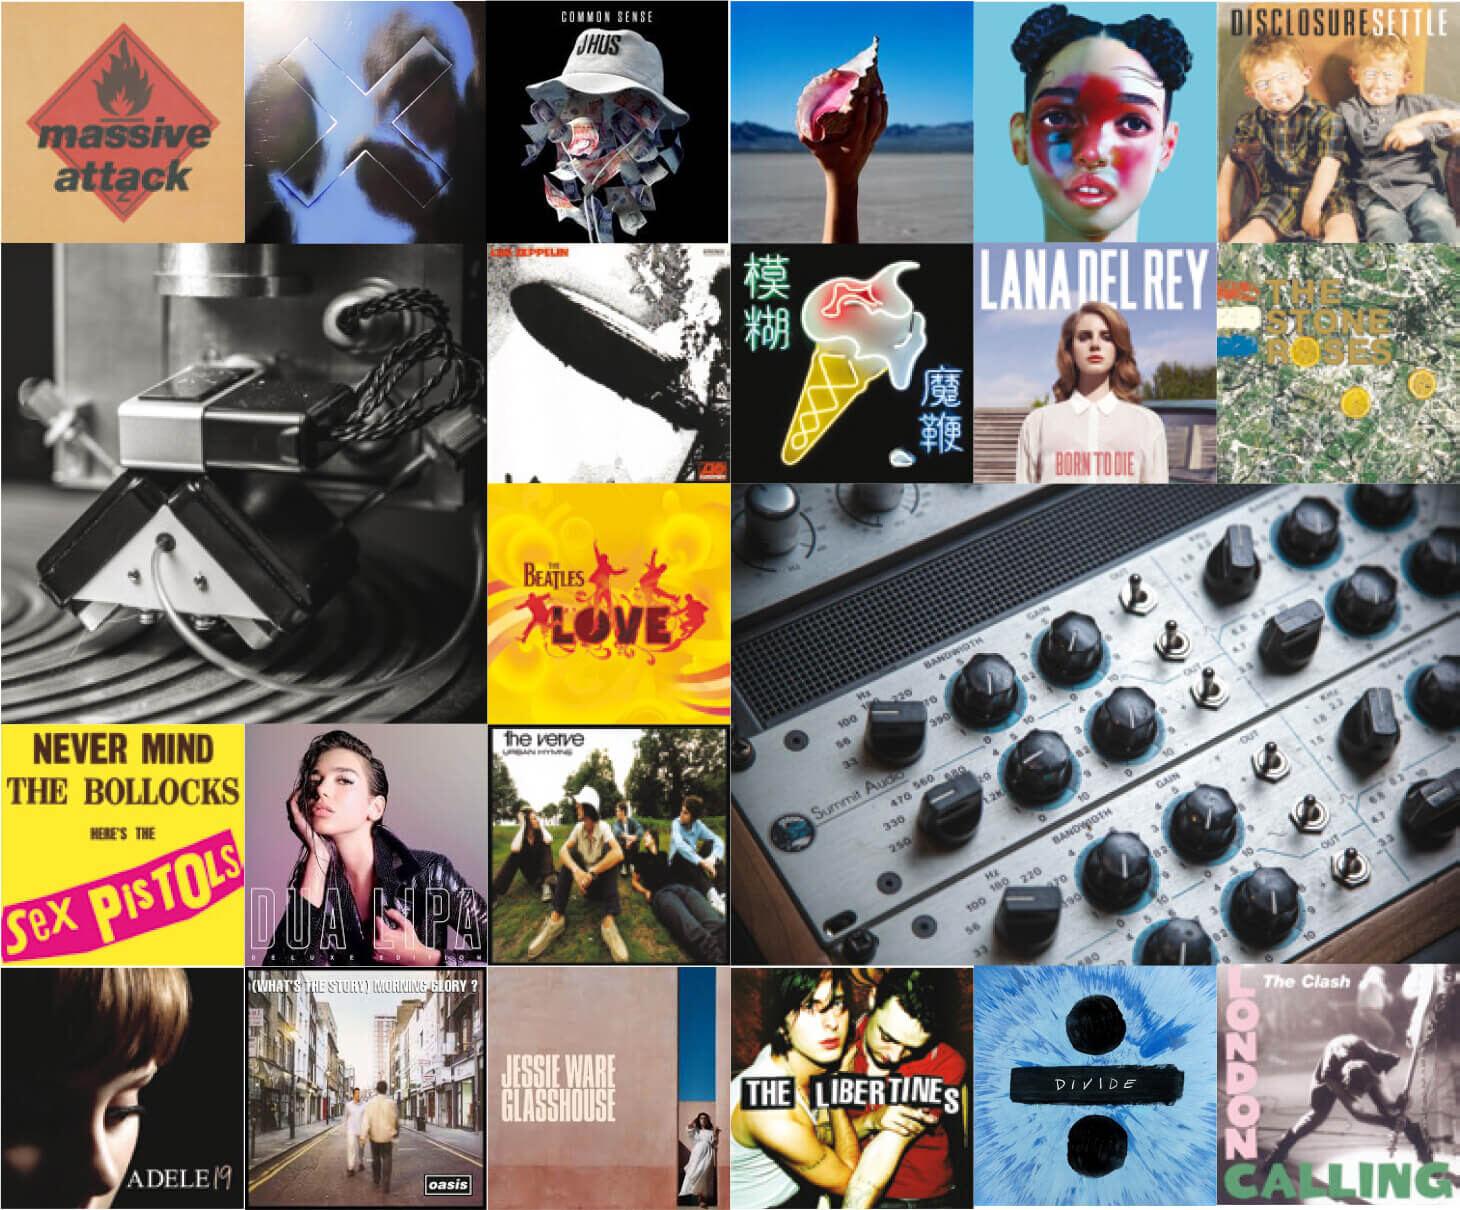 Artists album art collage